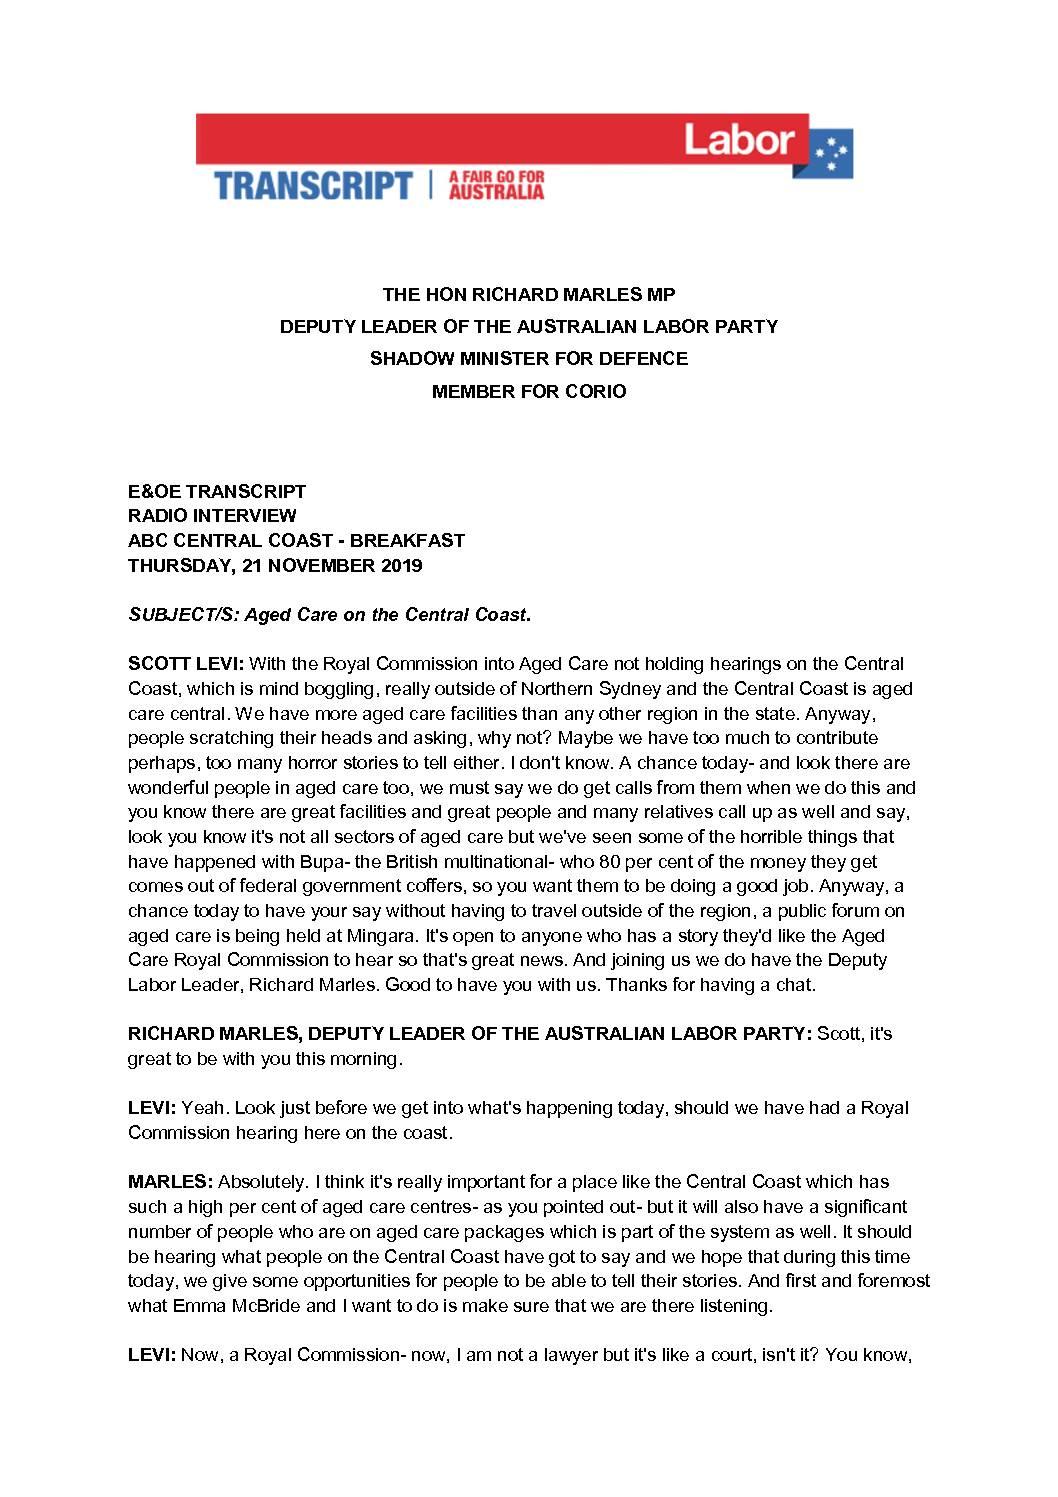 19.11.21 ABC RADIO CENTRAL COAST BREAKFAST WITH SCOTT LEVI – TRANSCRIPT